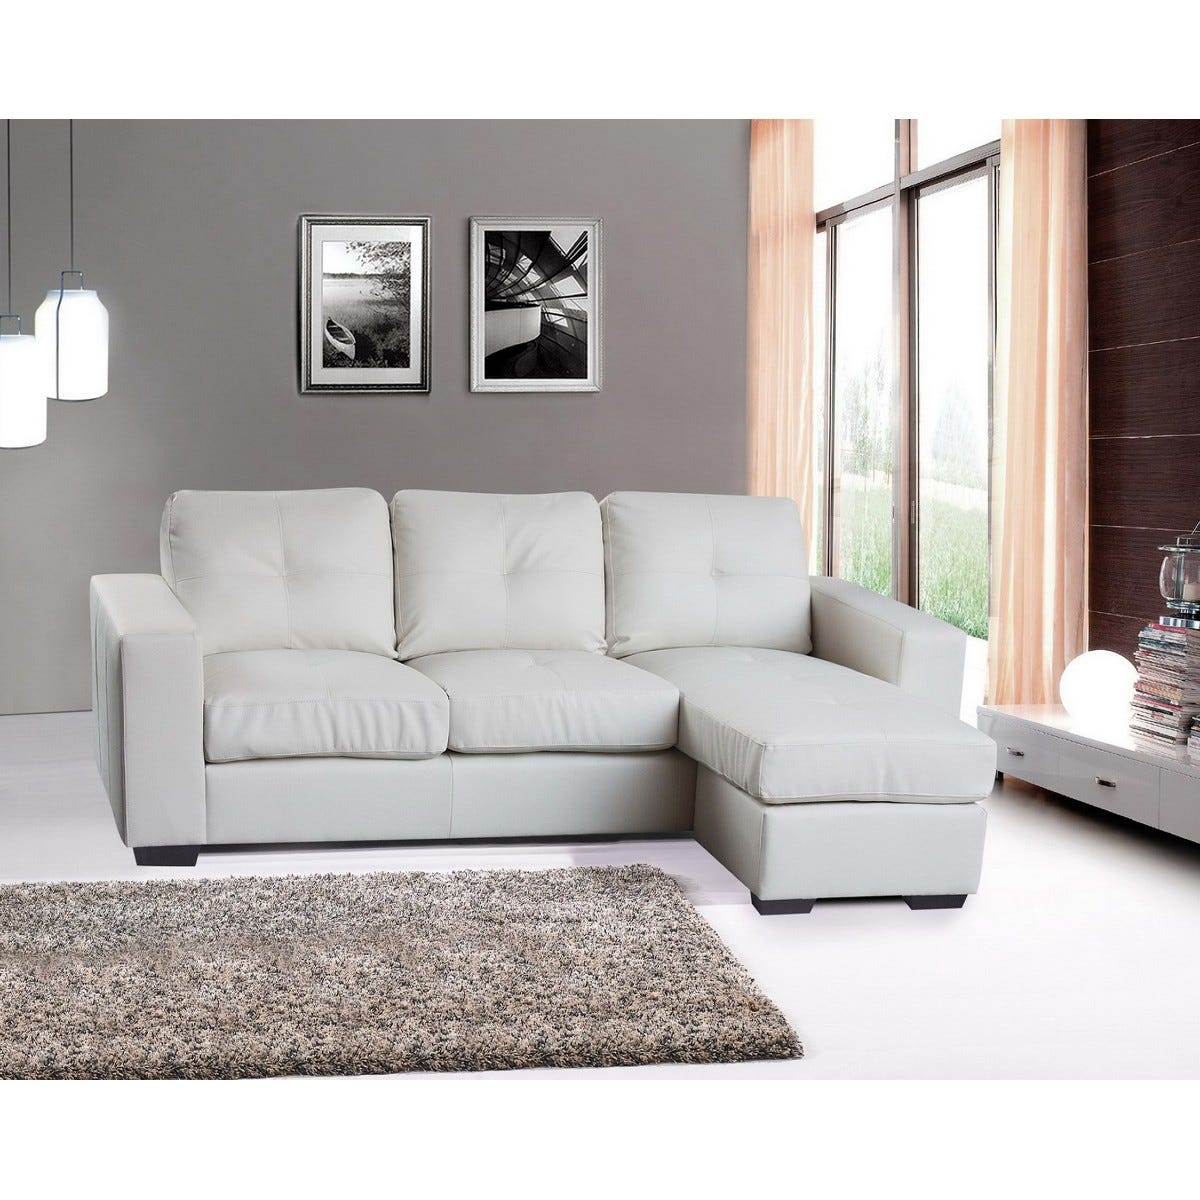 Darwen Bonded Faux Leather Corner Chaise Sofa White